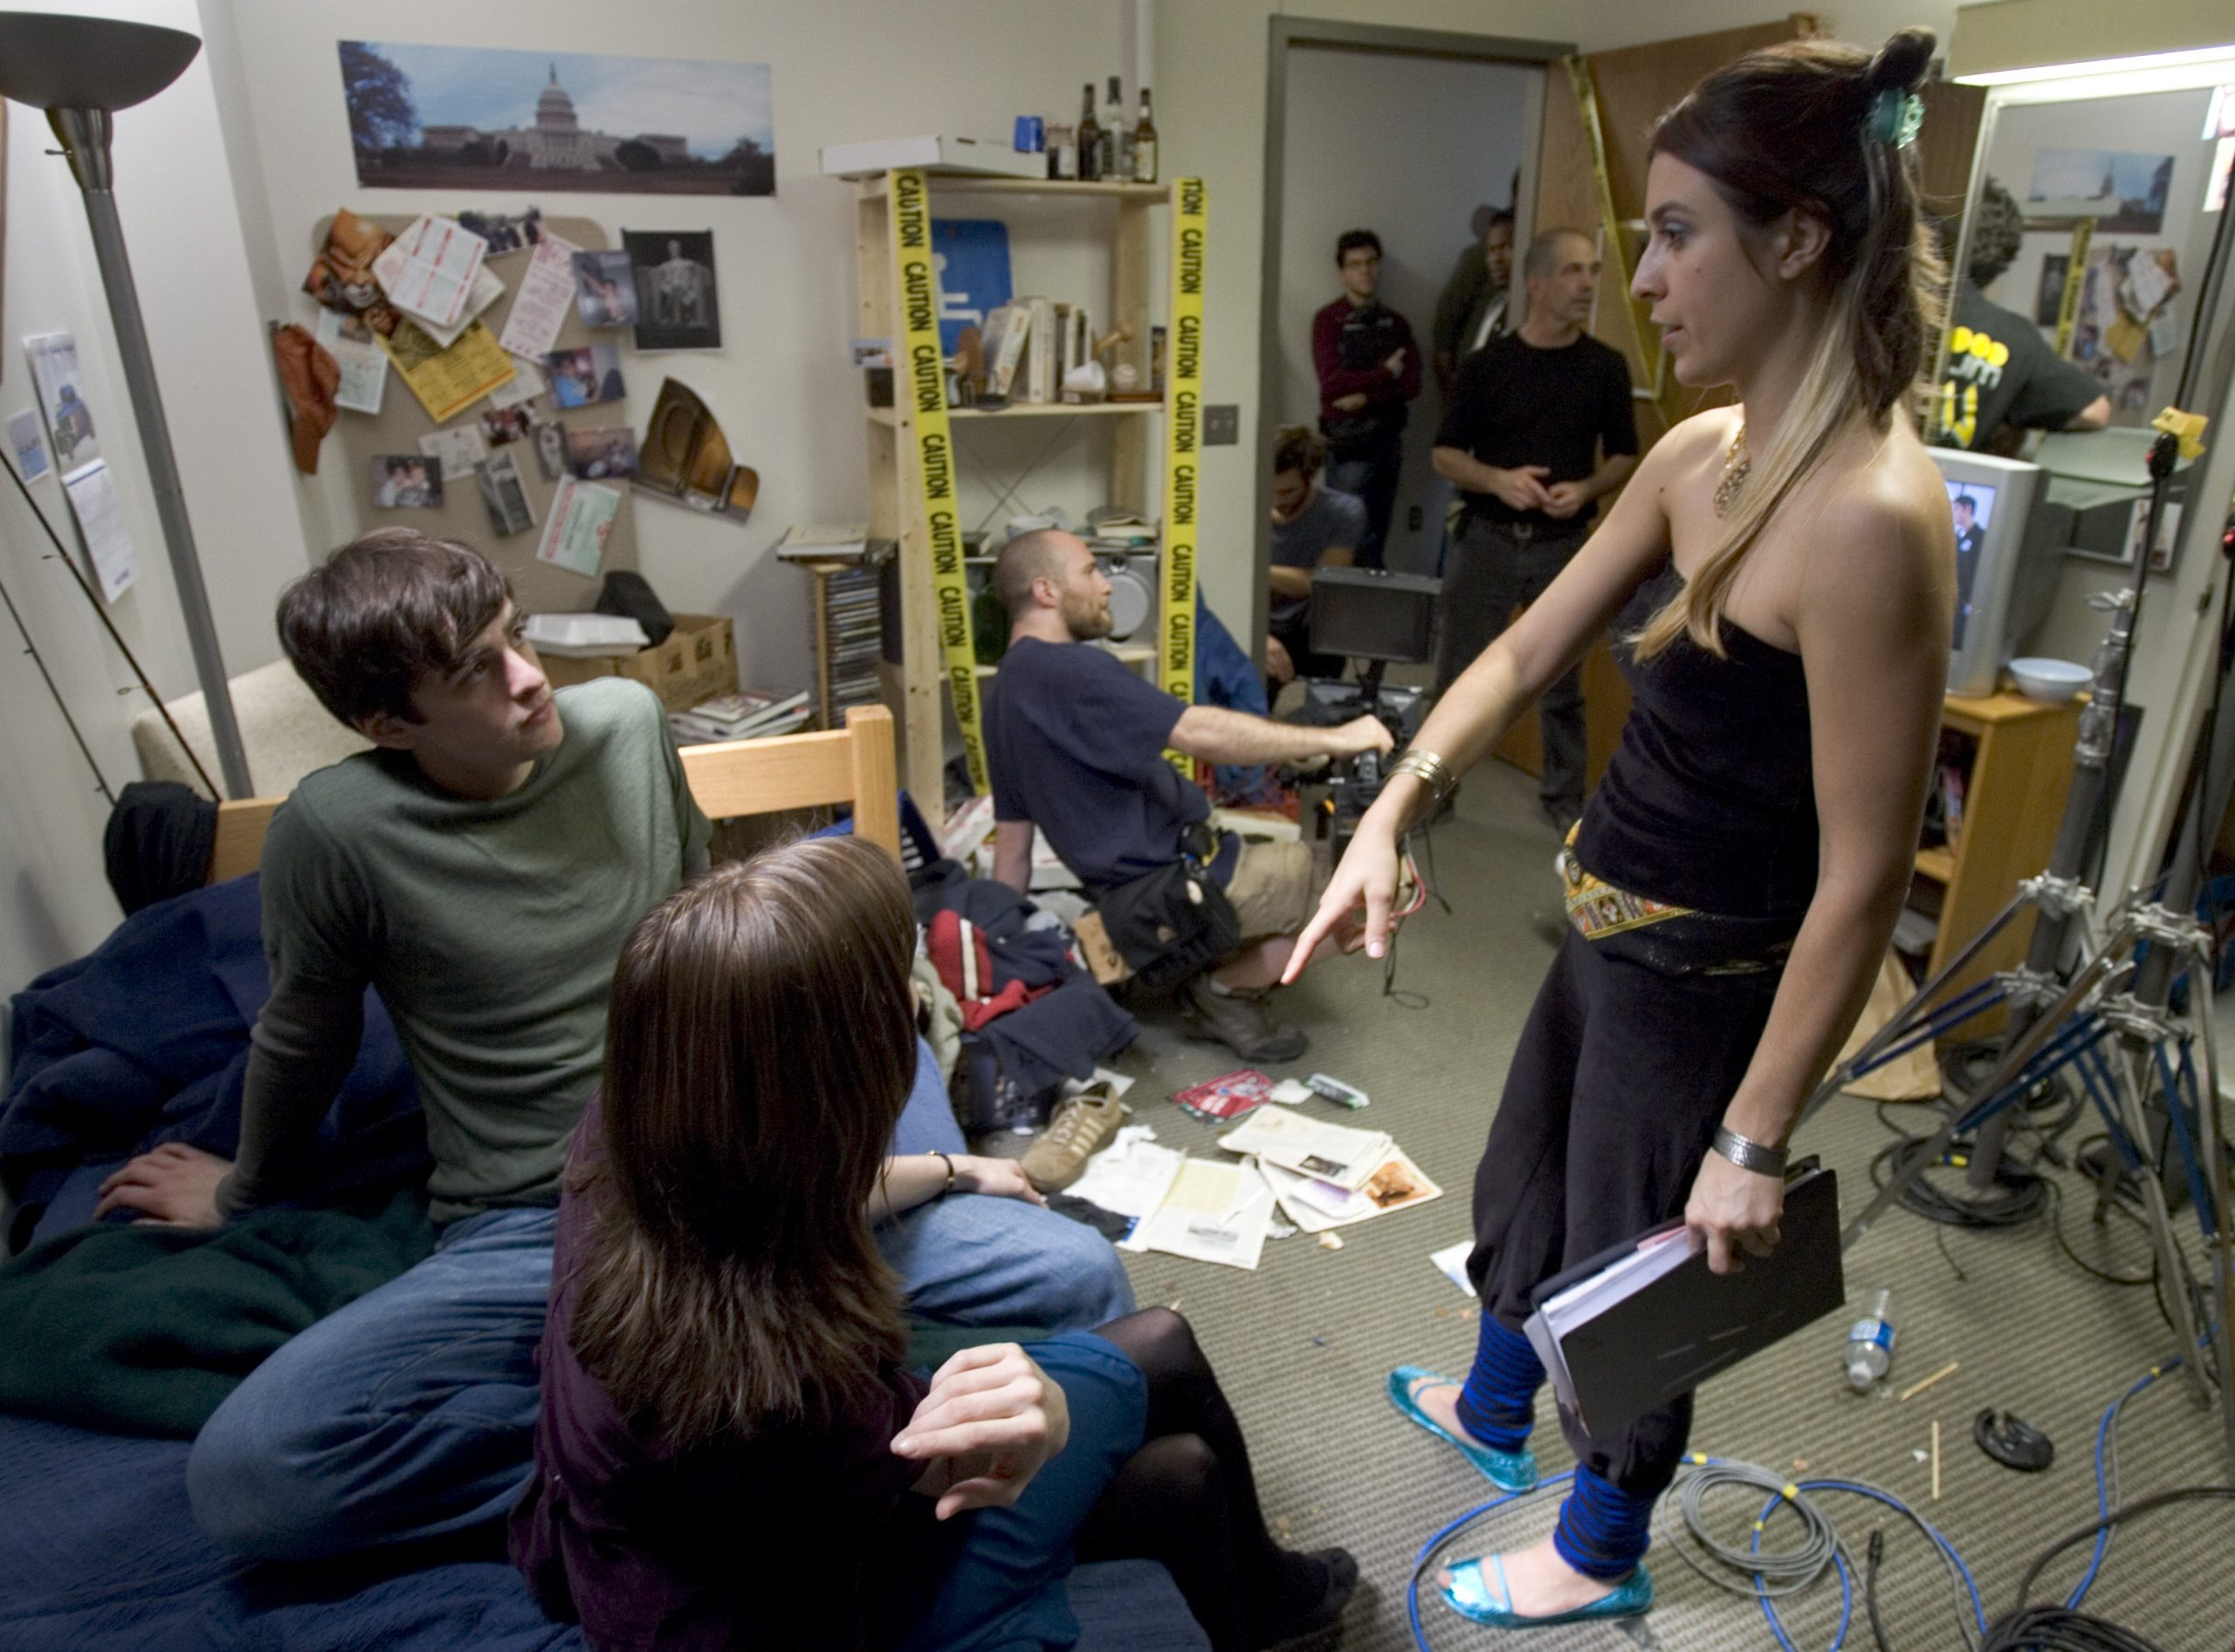 Leah Yananton directing Vincent Piazza and Christine Ryndak